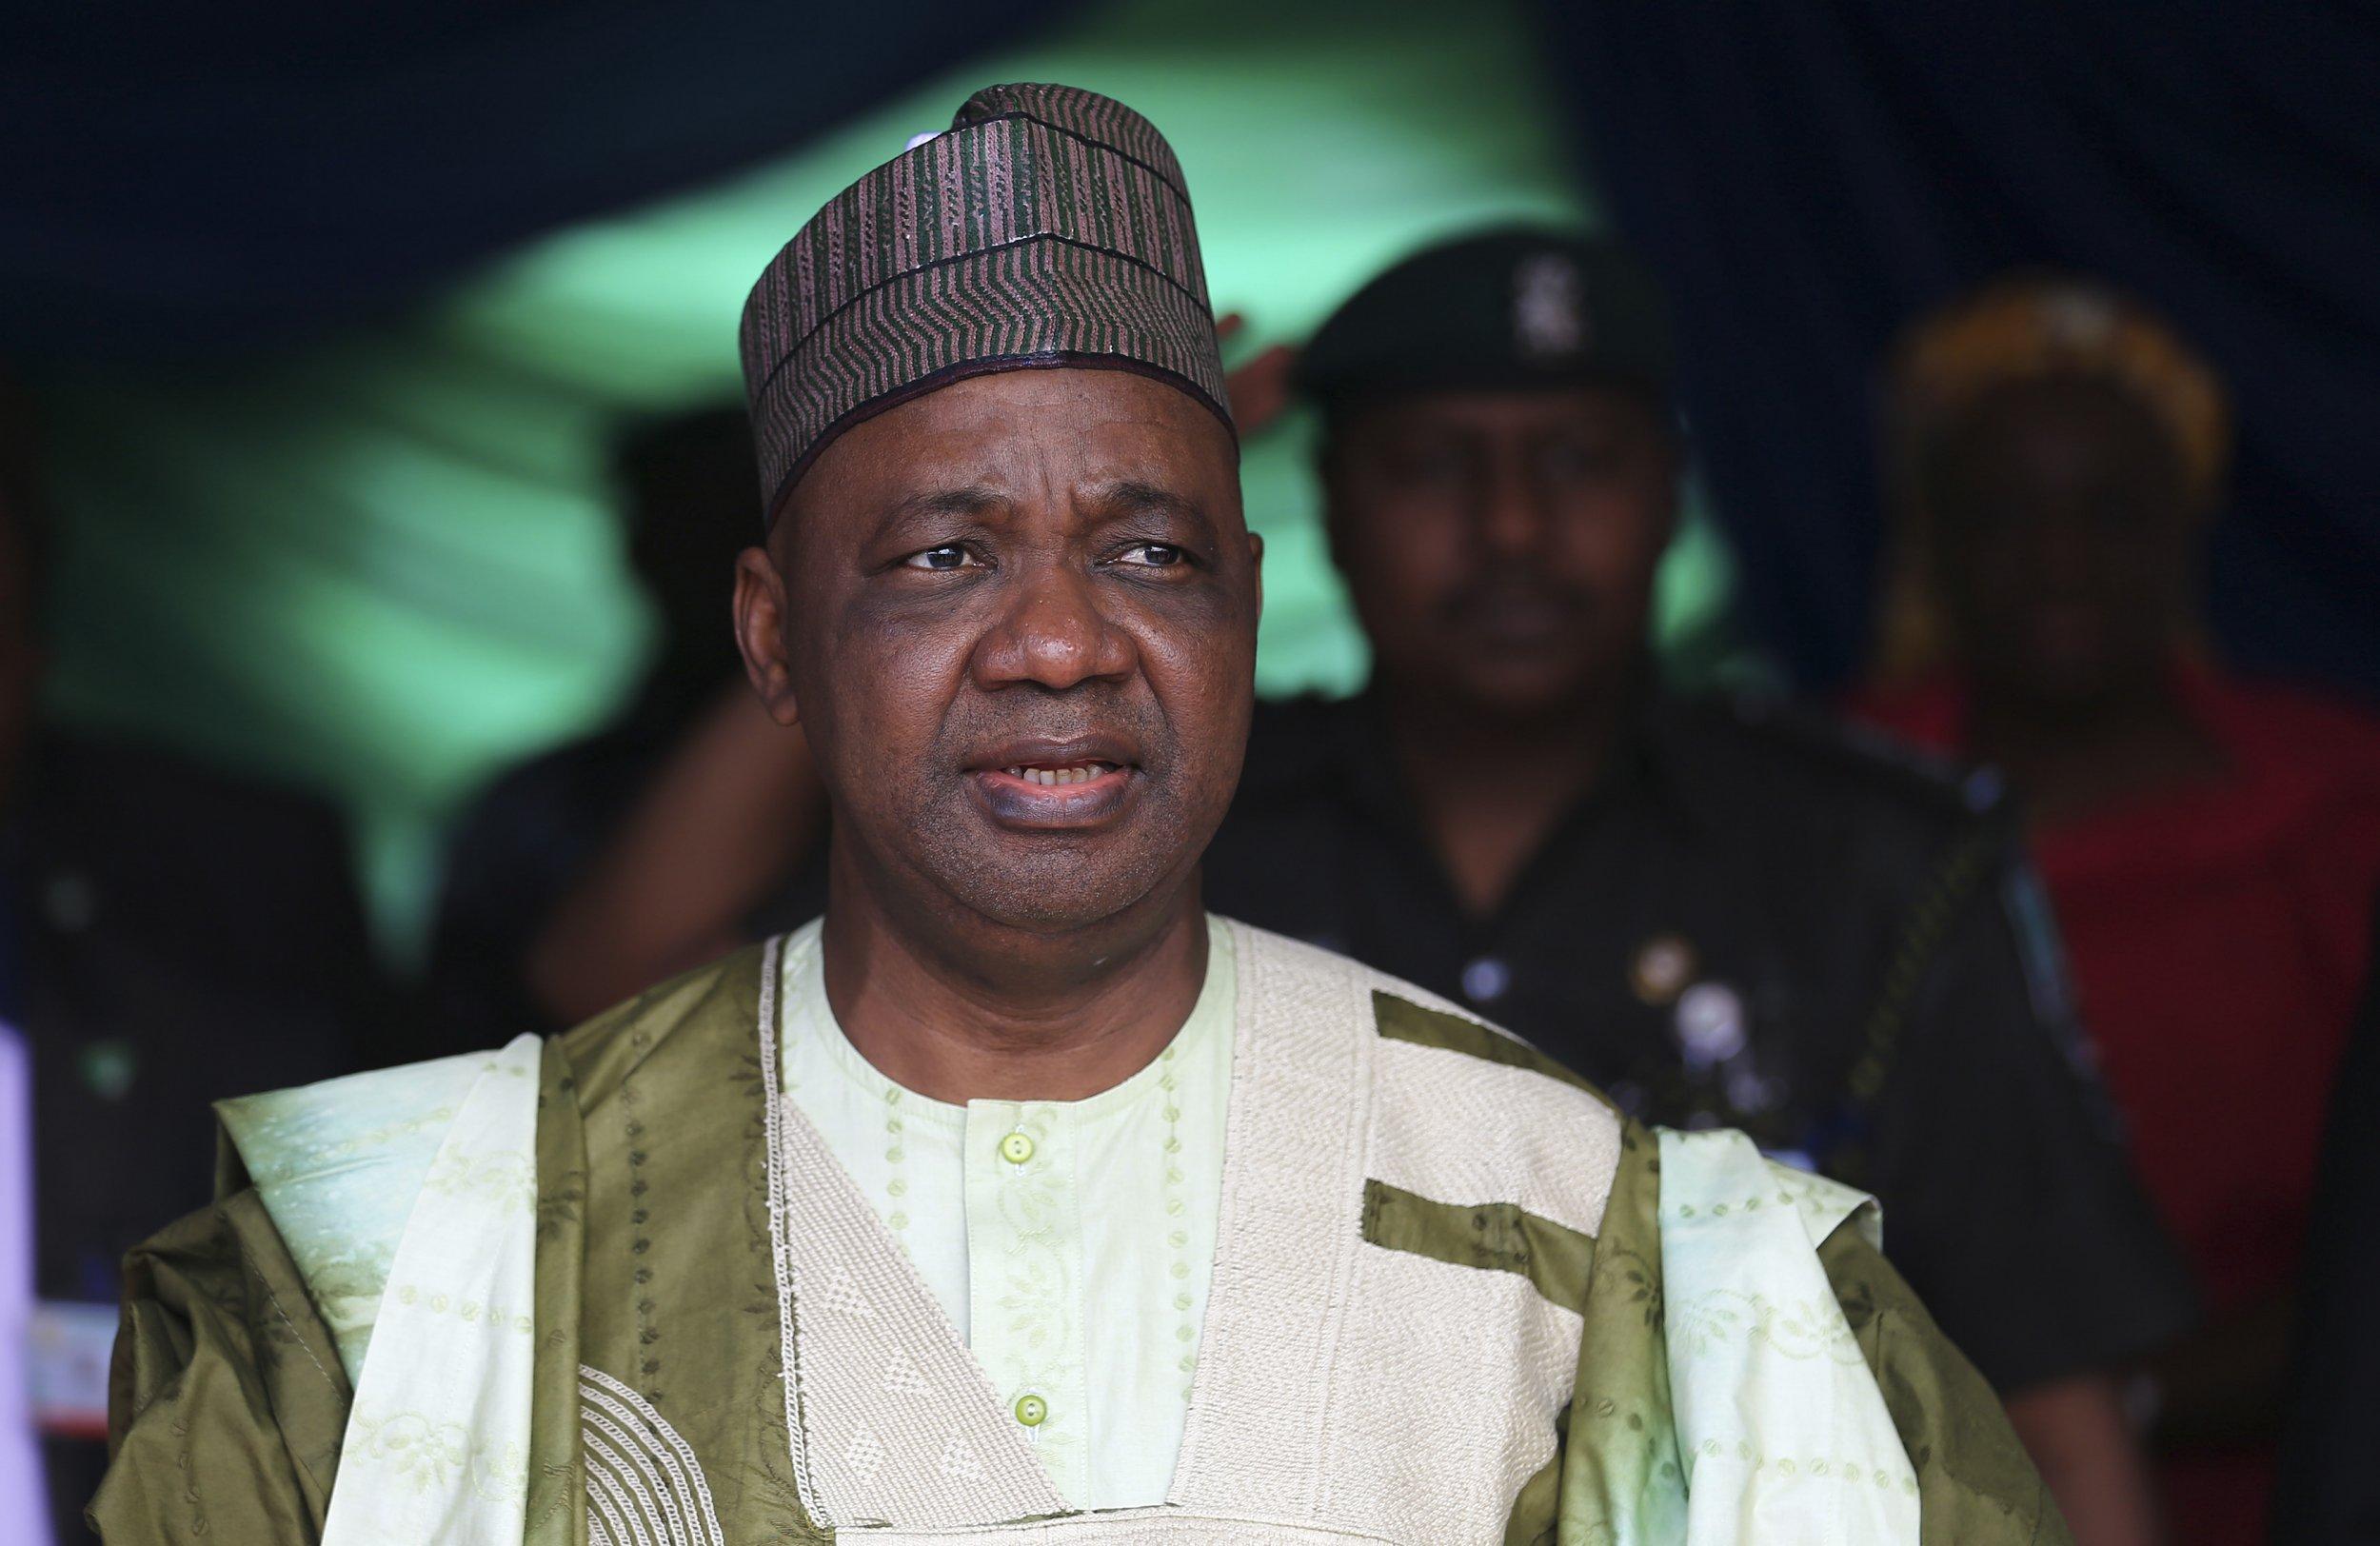 Former Nigerian vice president Namadi Sambo's office has reportedly been raided by Nigerian authorities.